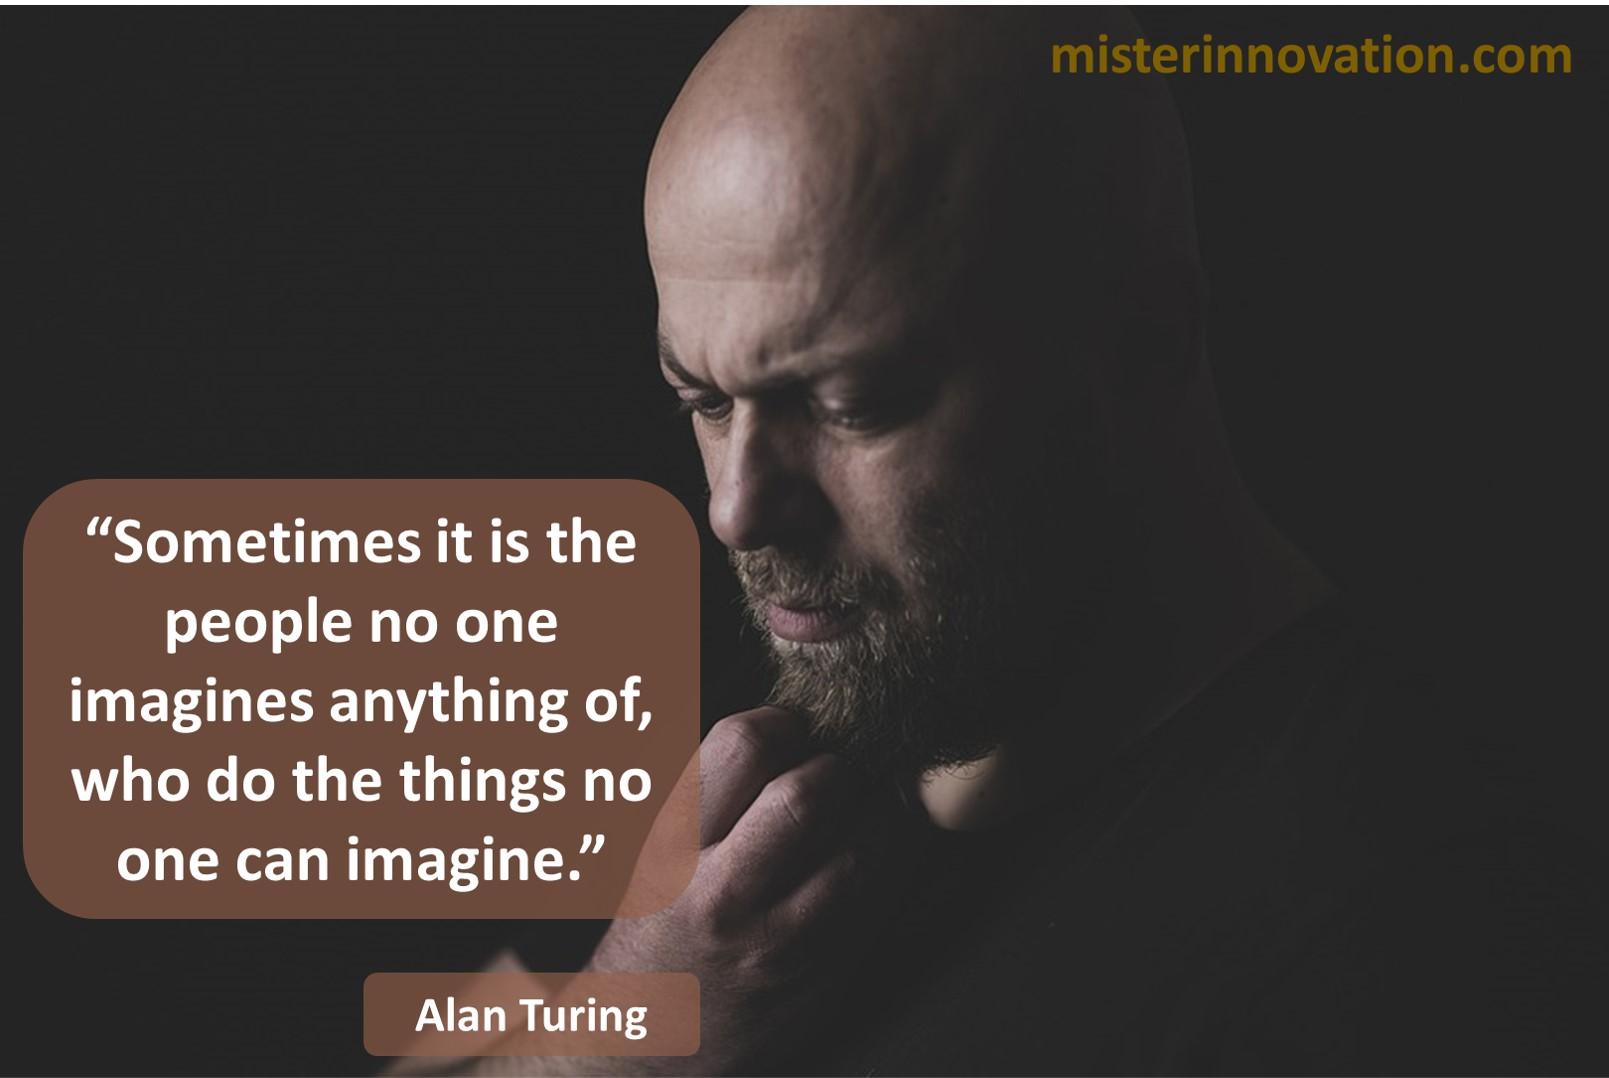 Alan Turing Imagine